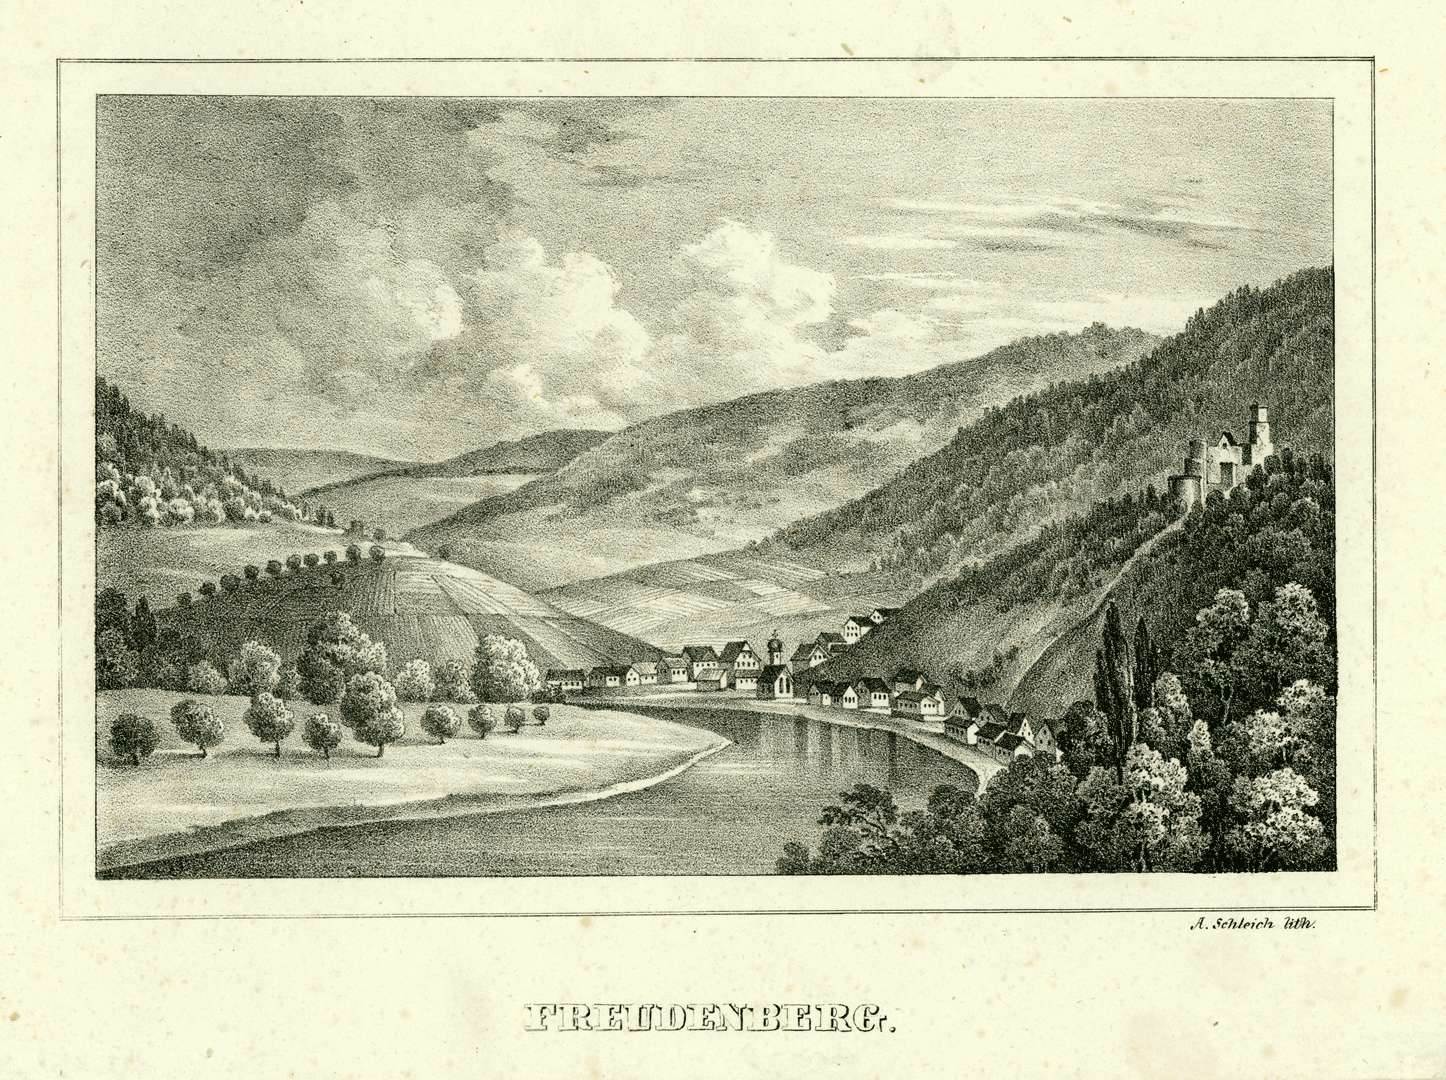 Freudenberg, Bild 1